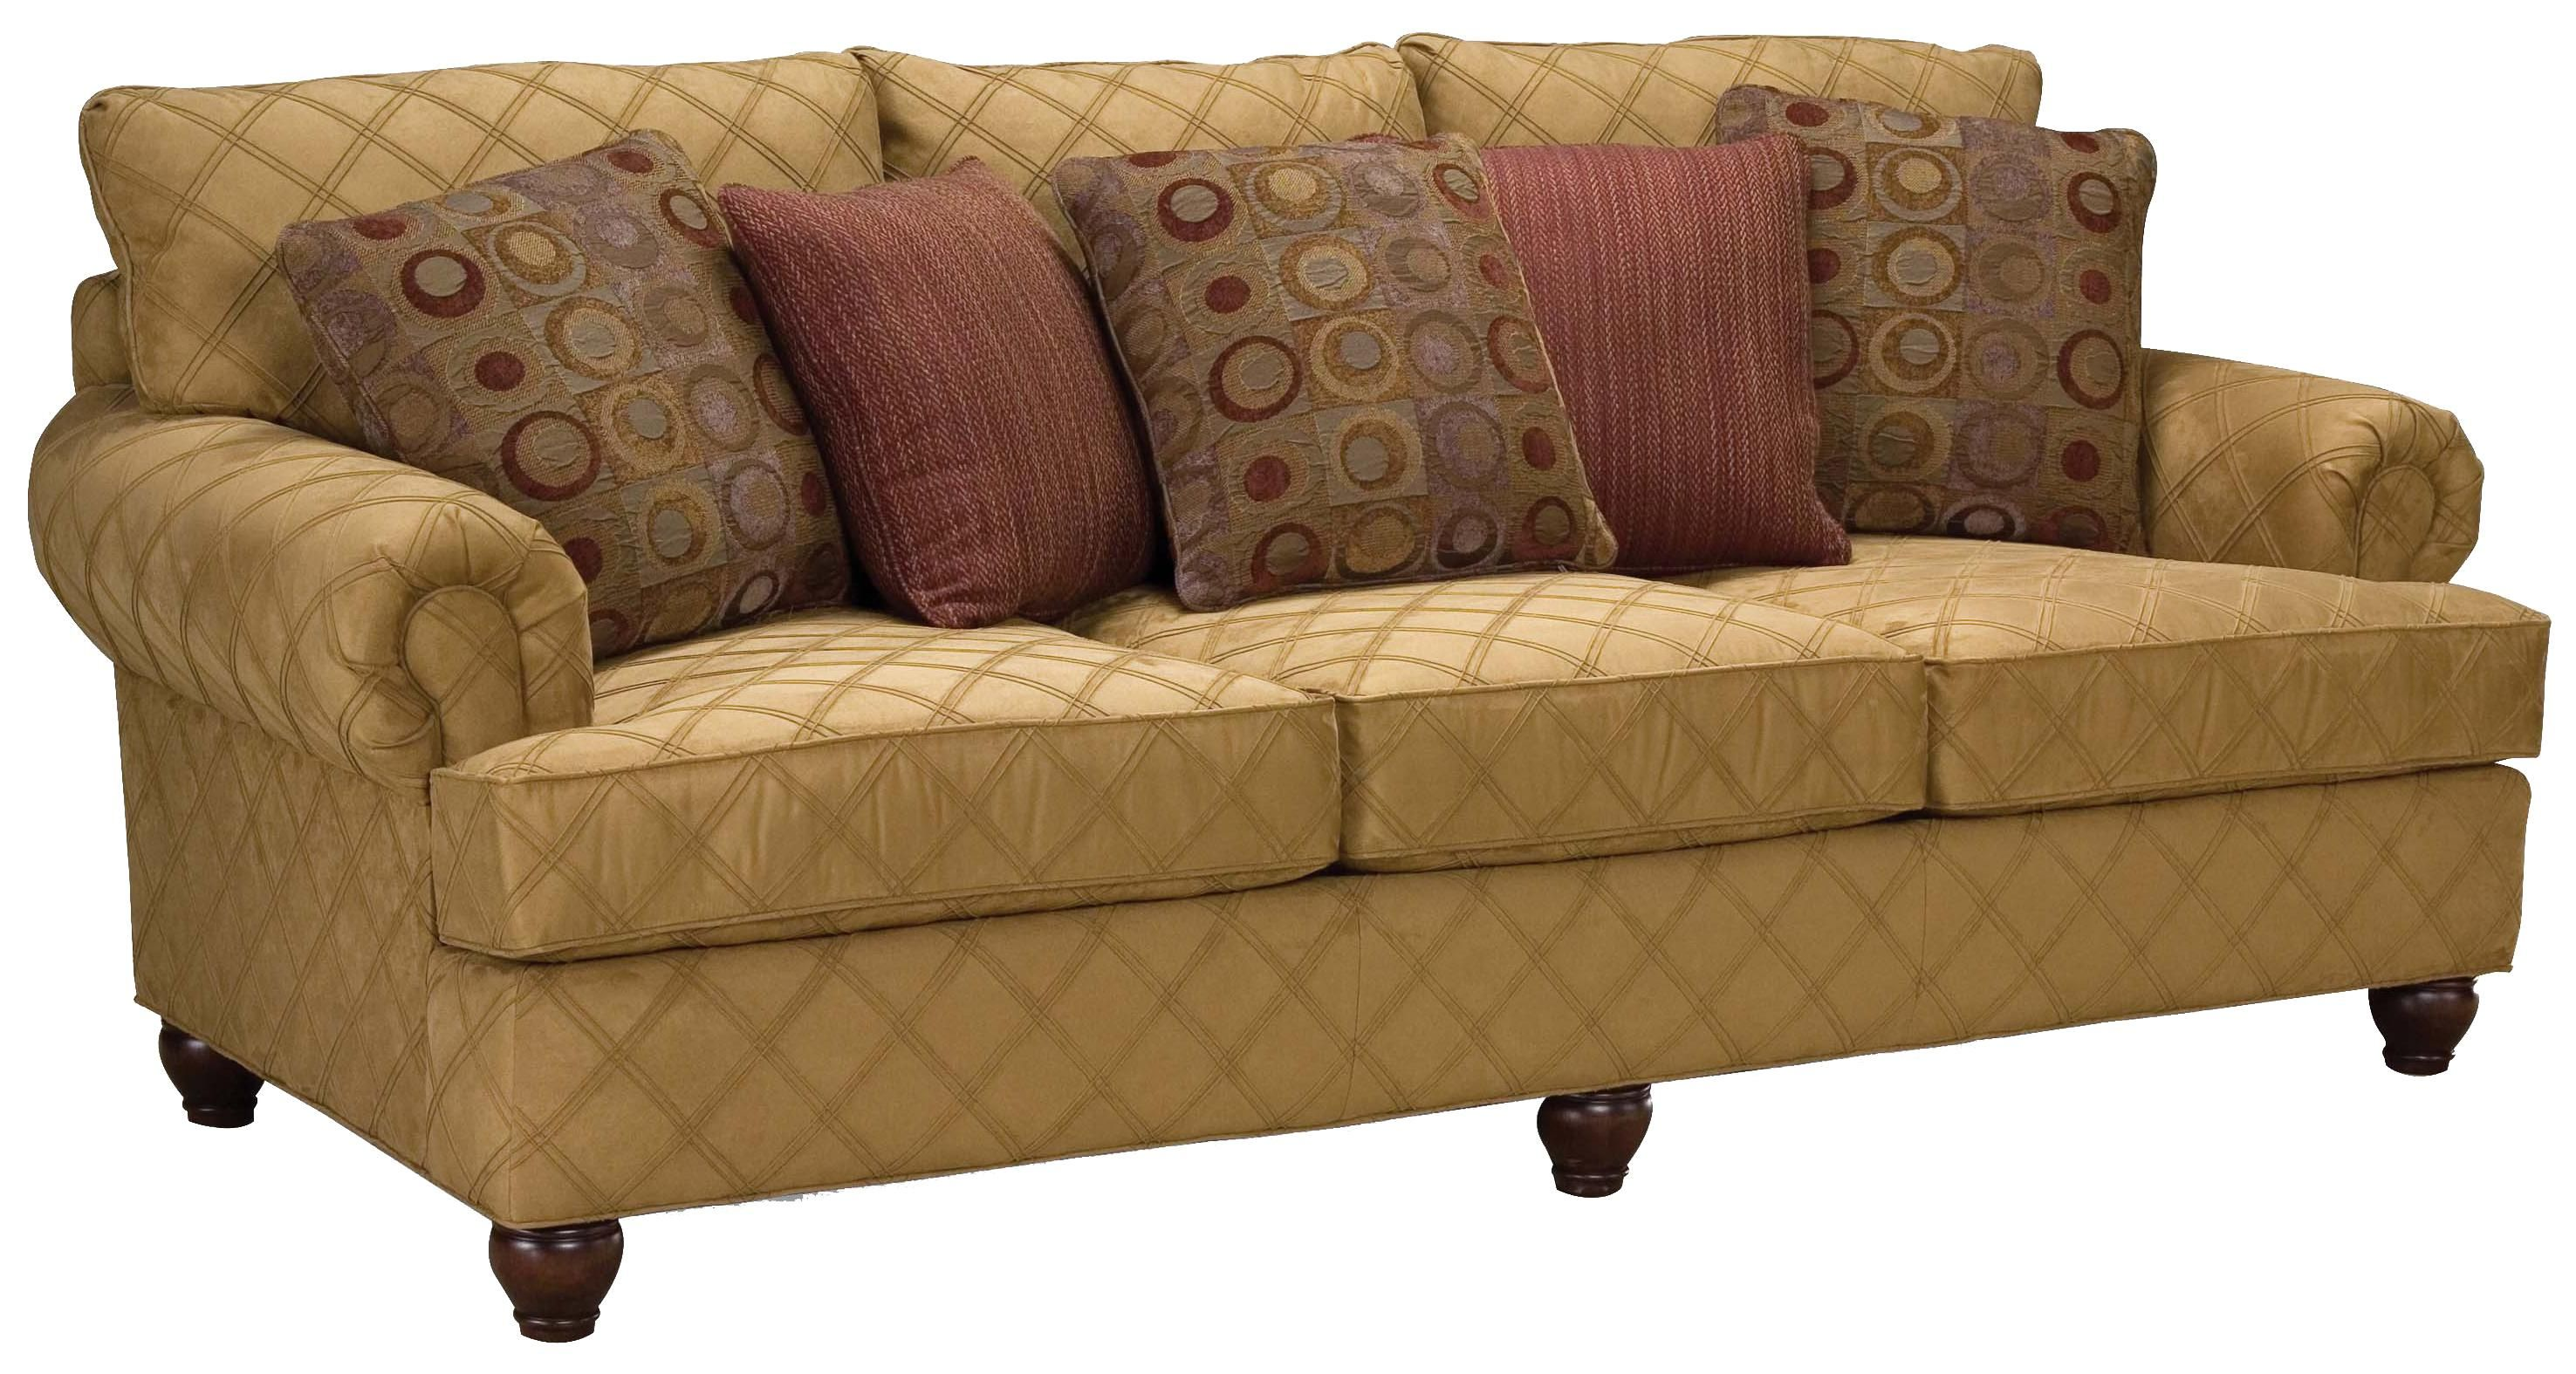 Superieur 3738 Rolled Arm Comfort Sofa By Fairfield   Belfort Furniture   Sofa  Washington DC, Northern Virginia (NoVA), Maryland, And Dulles, VA